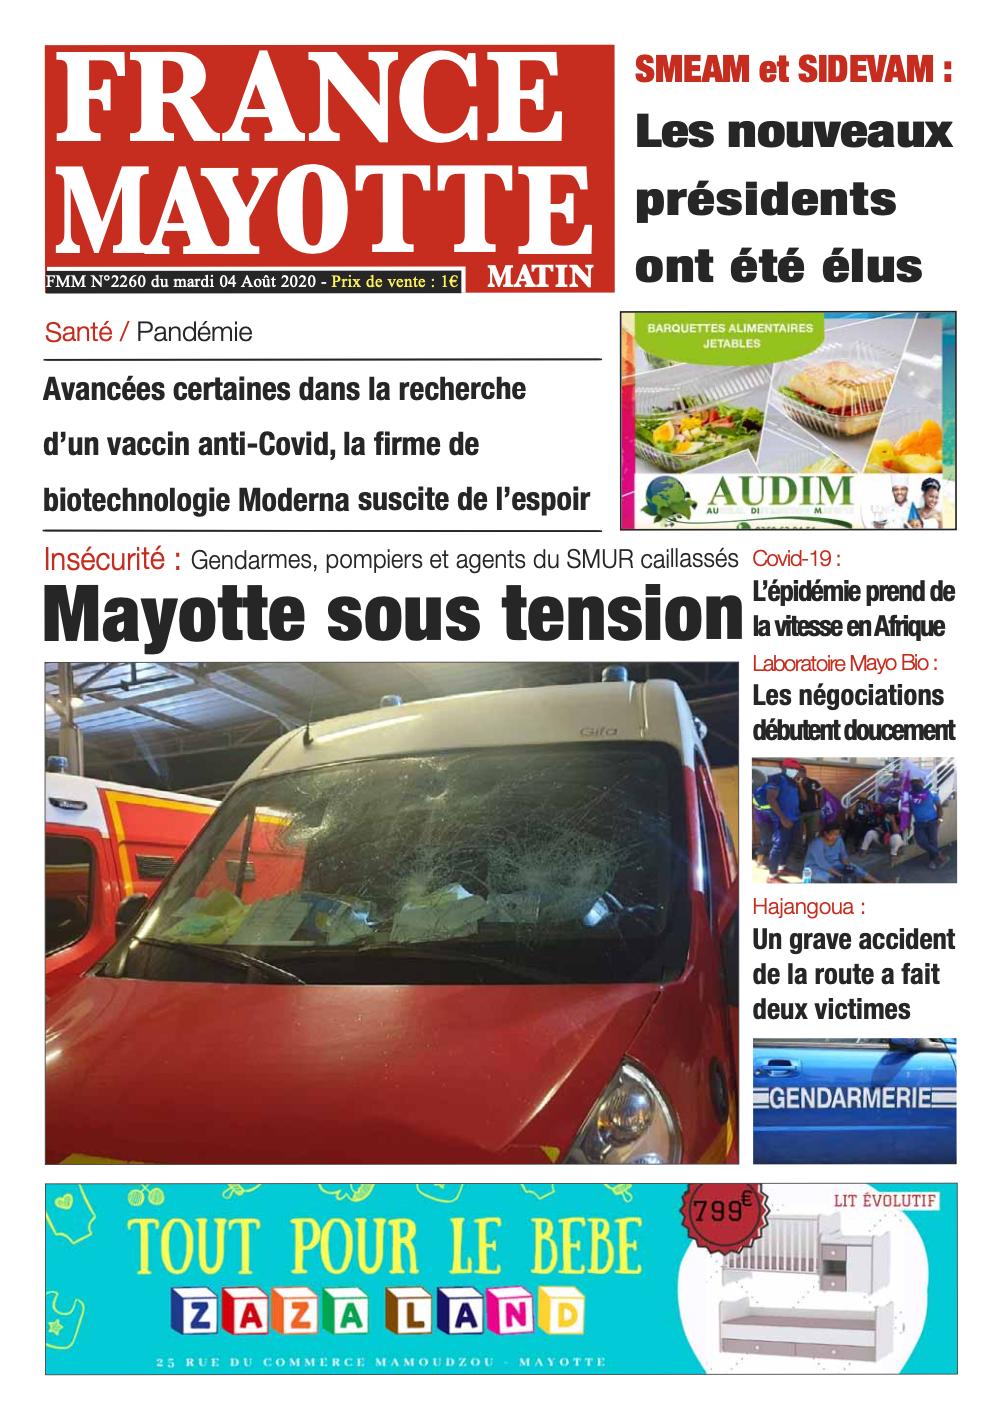 France Mayotte Mardi 4 août 2020